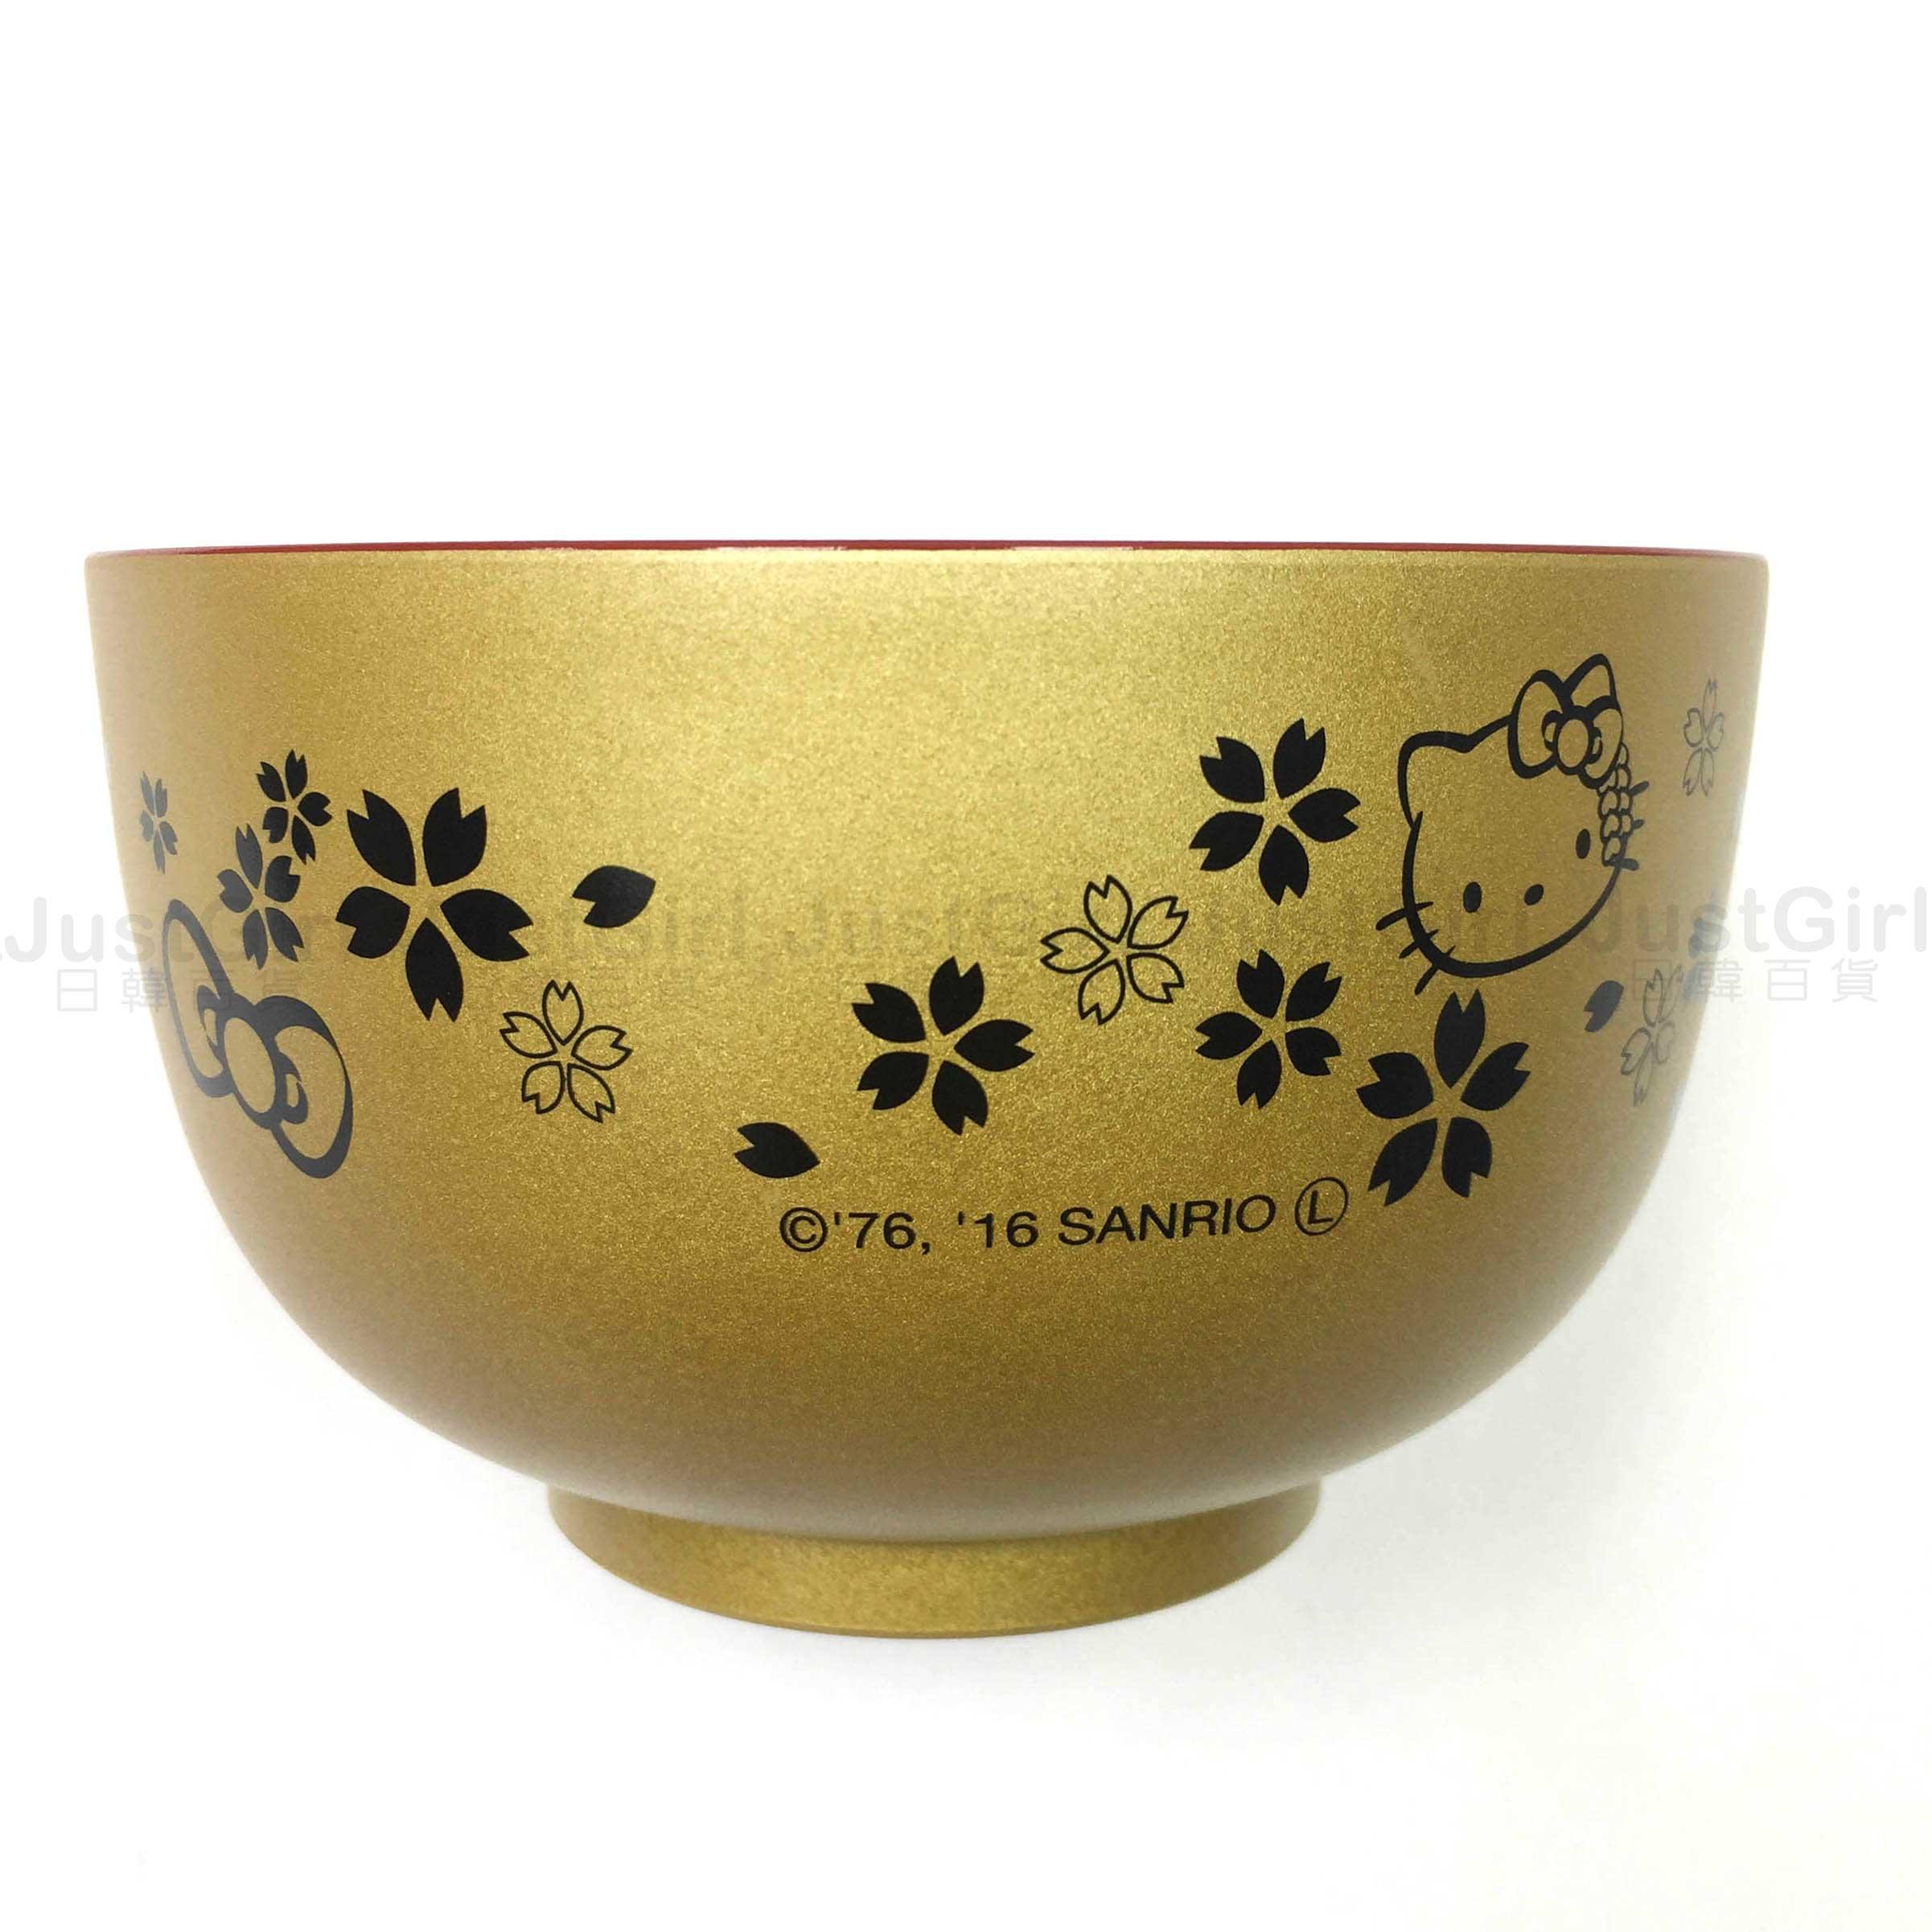 HELLO KITTY 碗 飯碗 湯碗 餐碗 日式和風 櫻花蝴蝶結和服 金色 餐具 正版日本製造進口 JustGirl